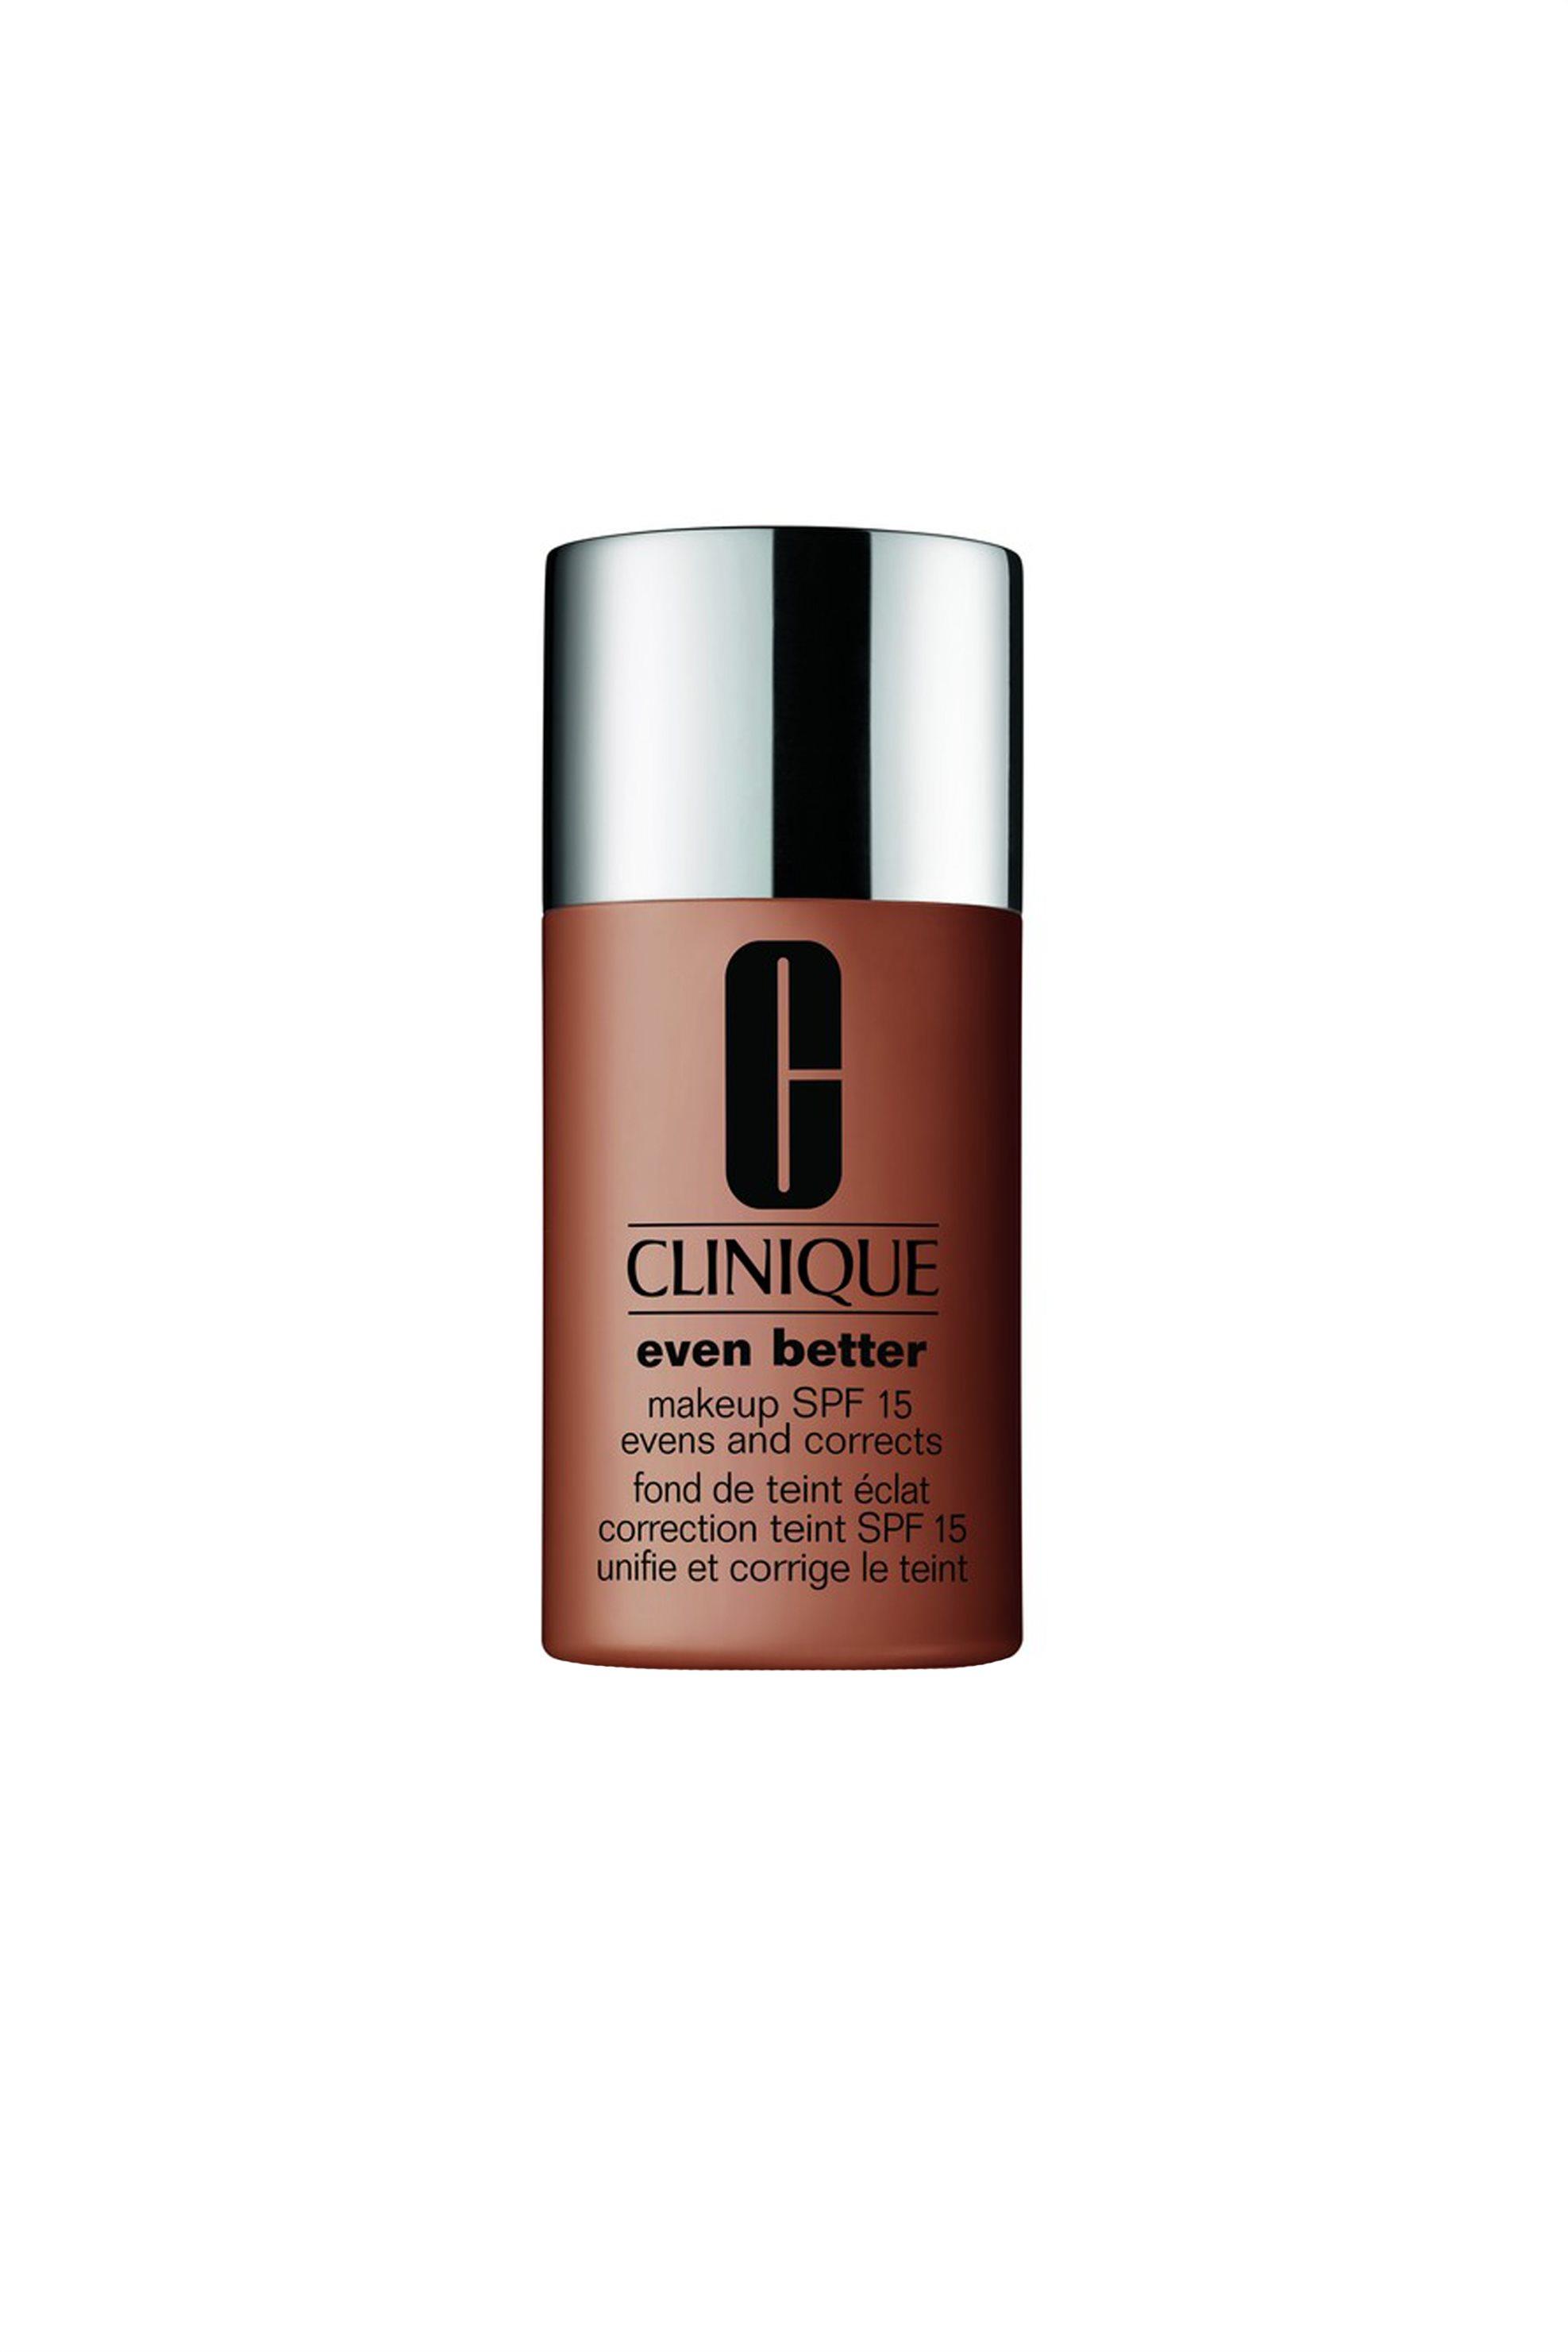 Clinique Even Better™ Makeup SPF 15 WN 124 Sienna 30 ml - 6MNY20A000 ομορφια   καλλυντικα επιλεκτικησ   μακιγιάζ   πρόσωπο   make ups   foundations